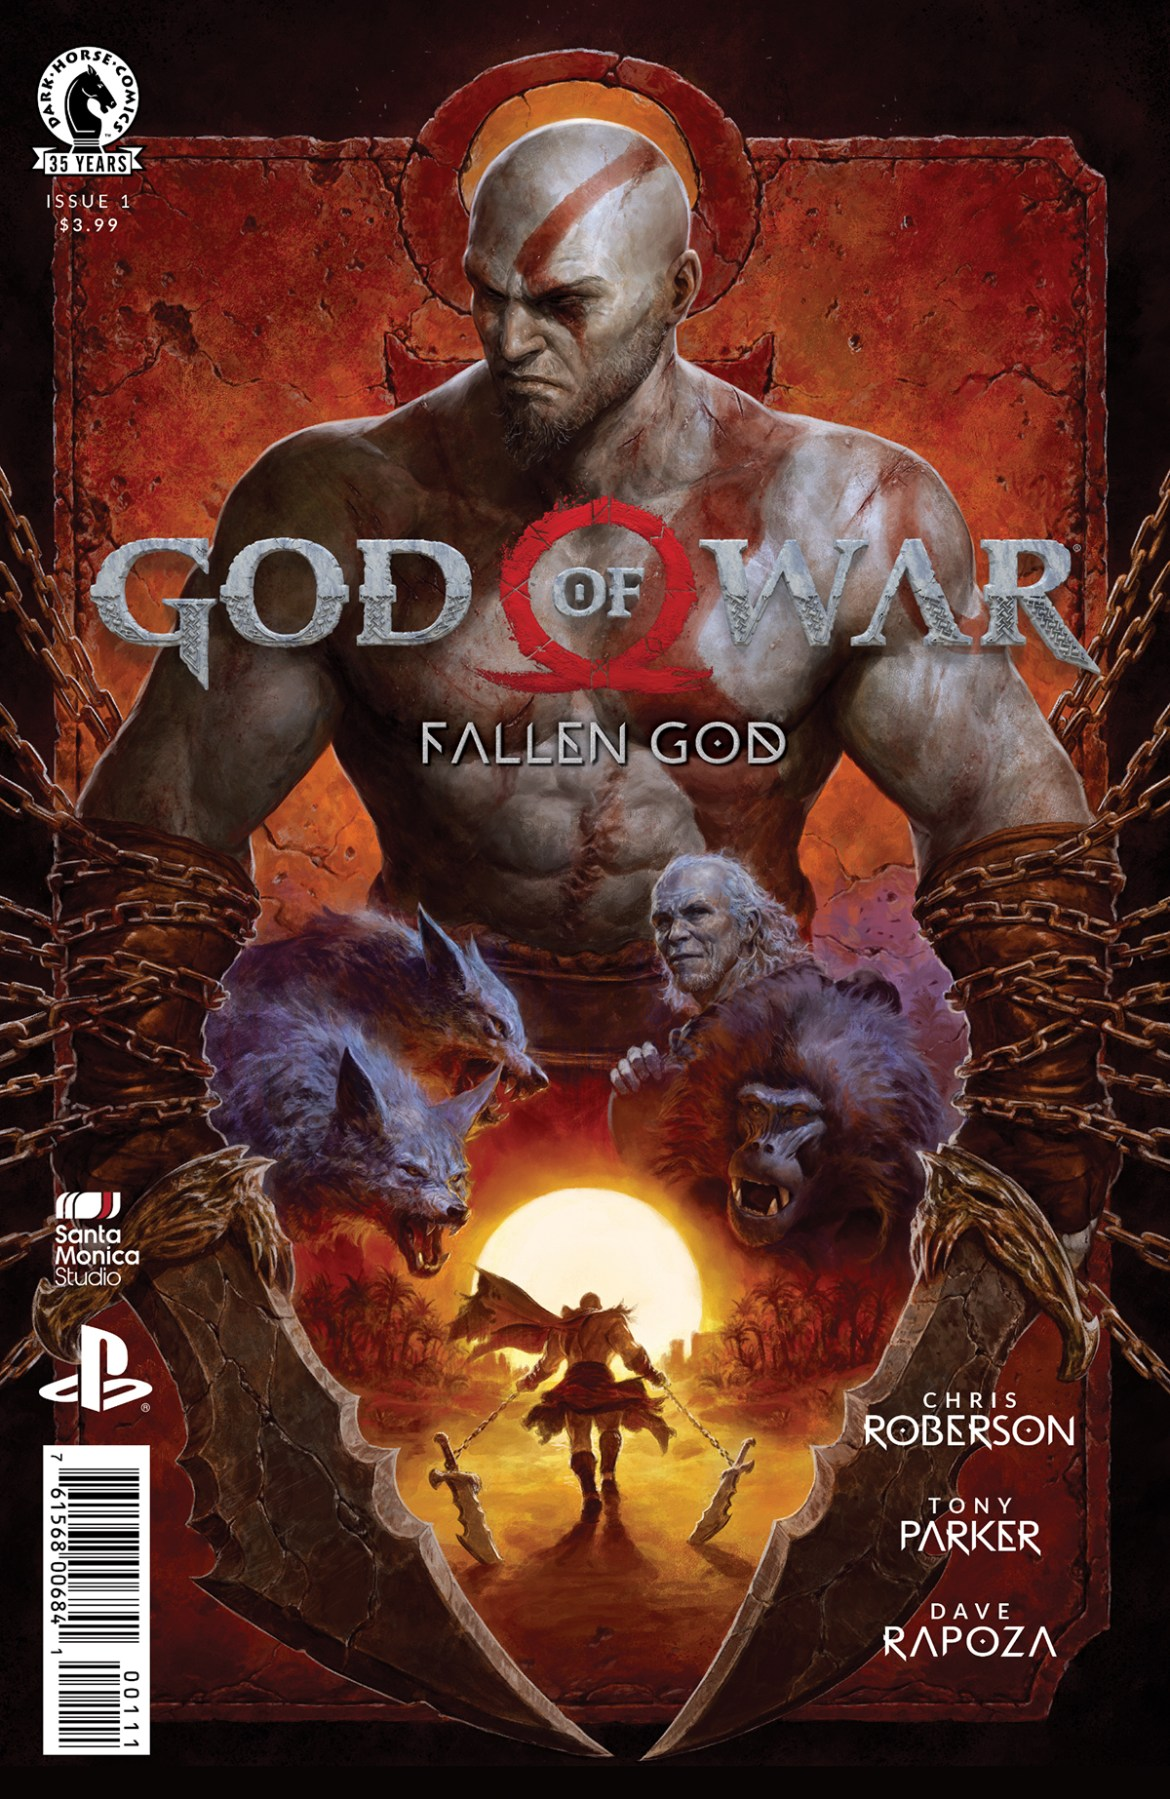 fallengodcov God of War returns in new mini-series FALLEN GOD